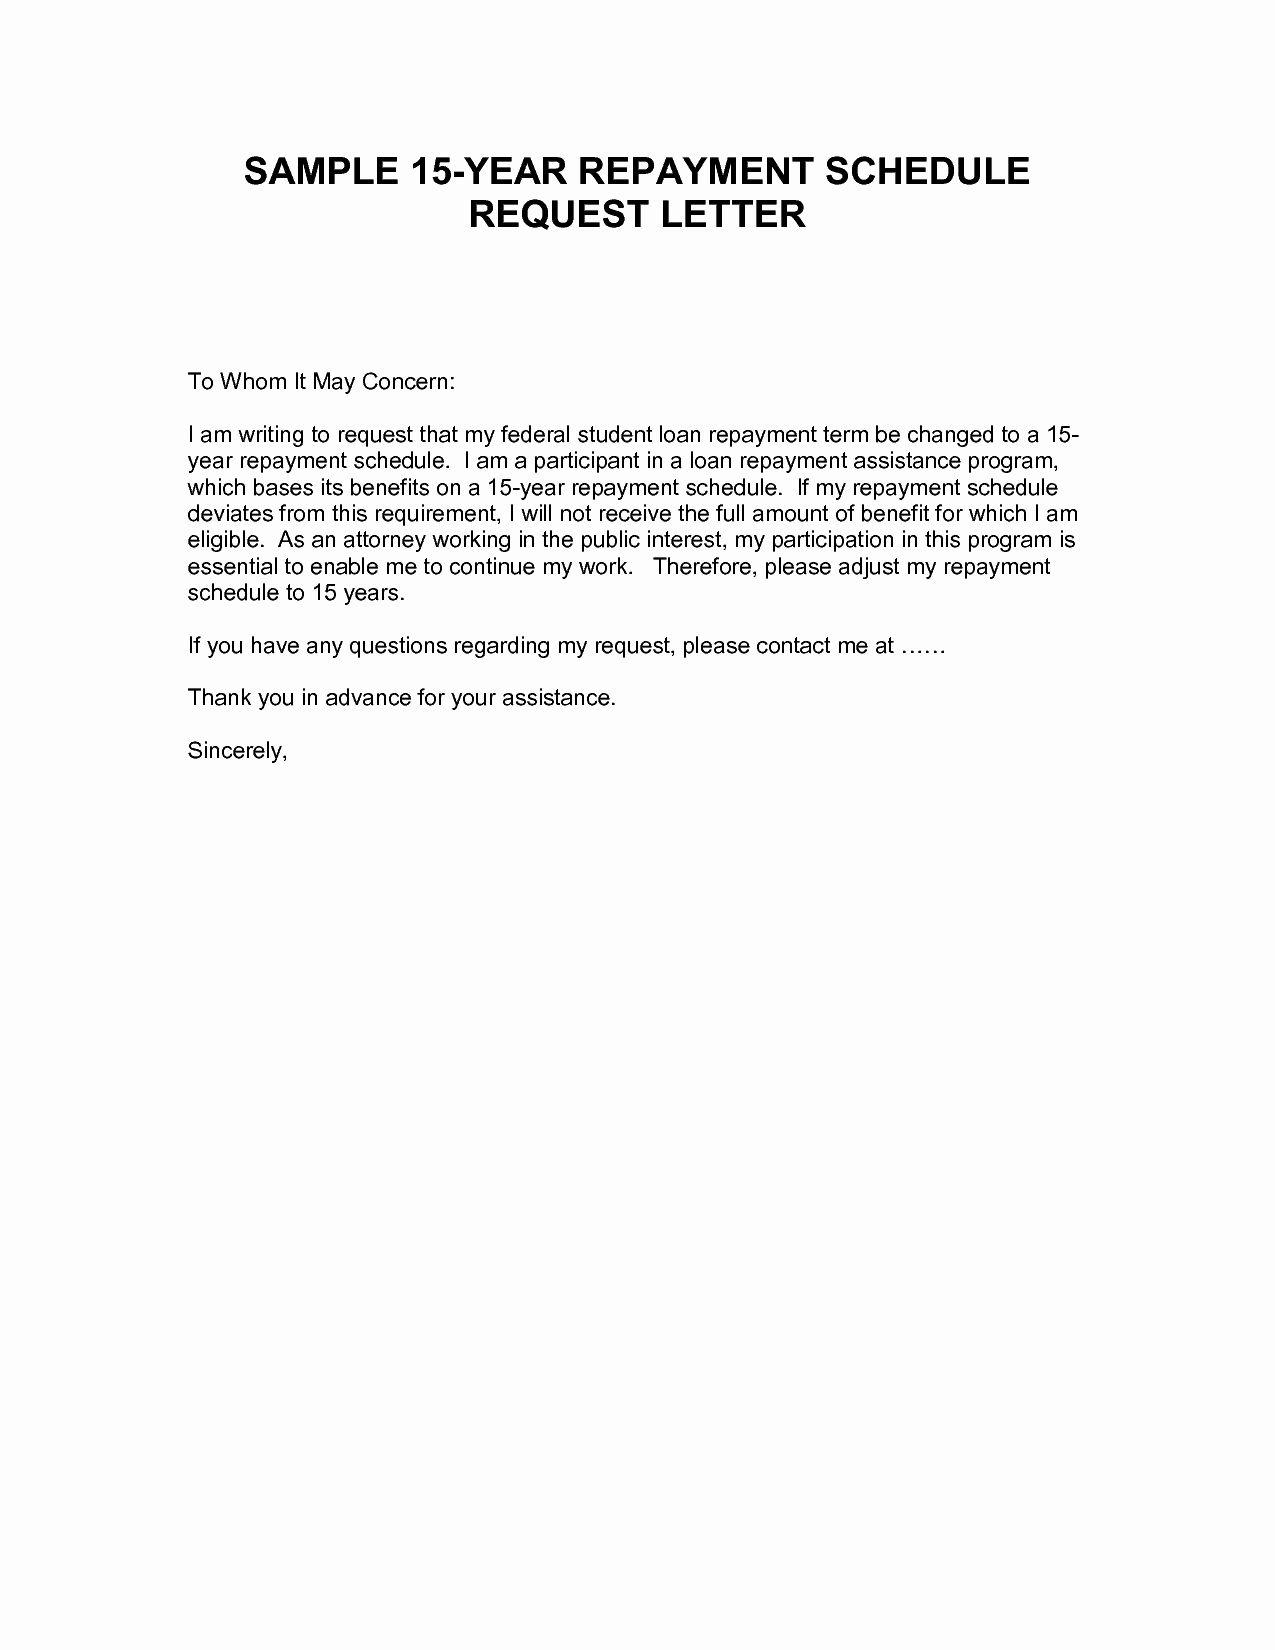 Personal Loan Letter format Unique Personal Loan Letter